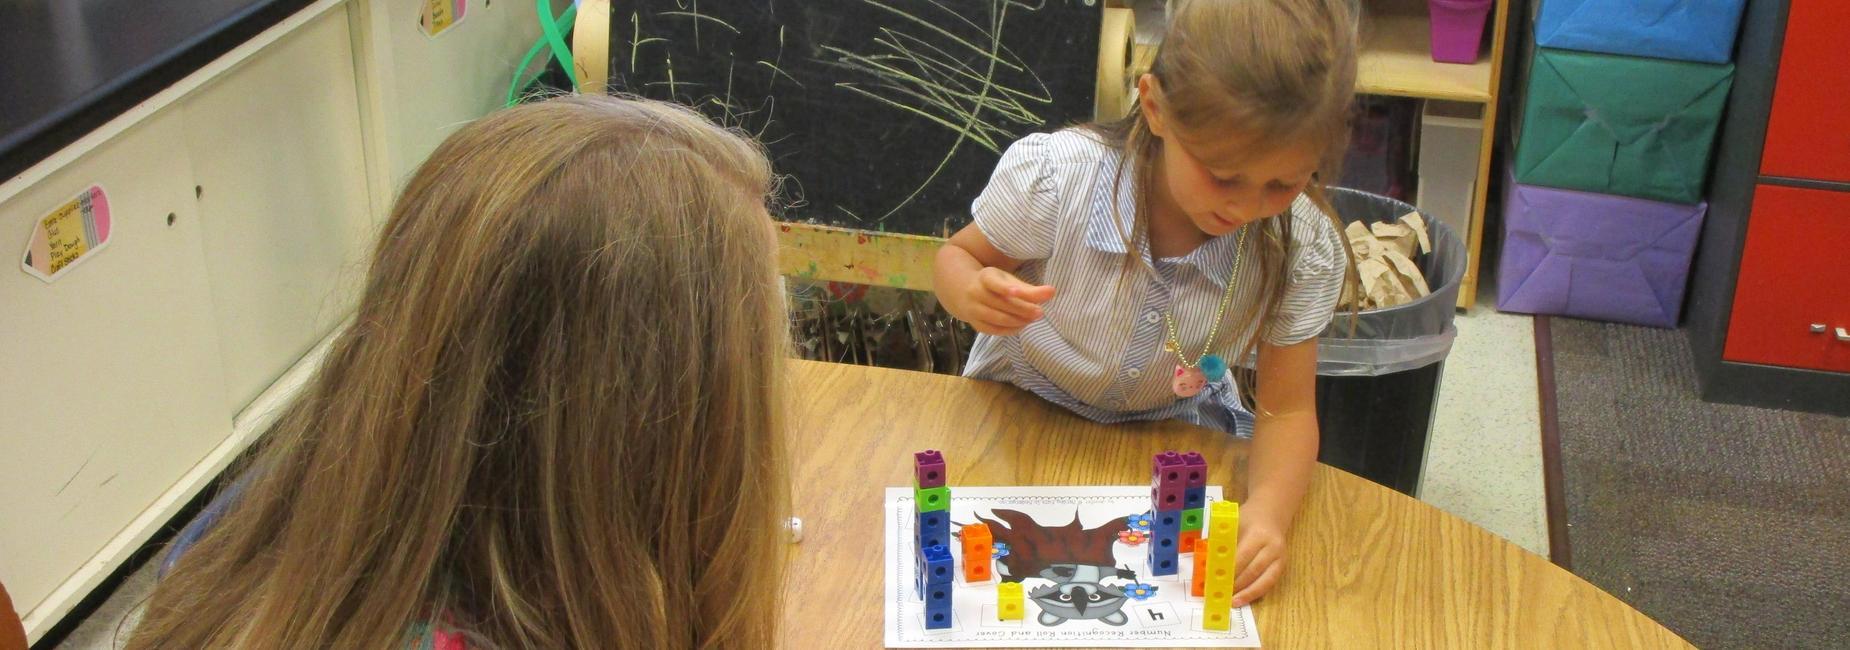 kindergarten working on counting blocks